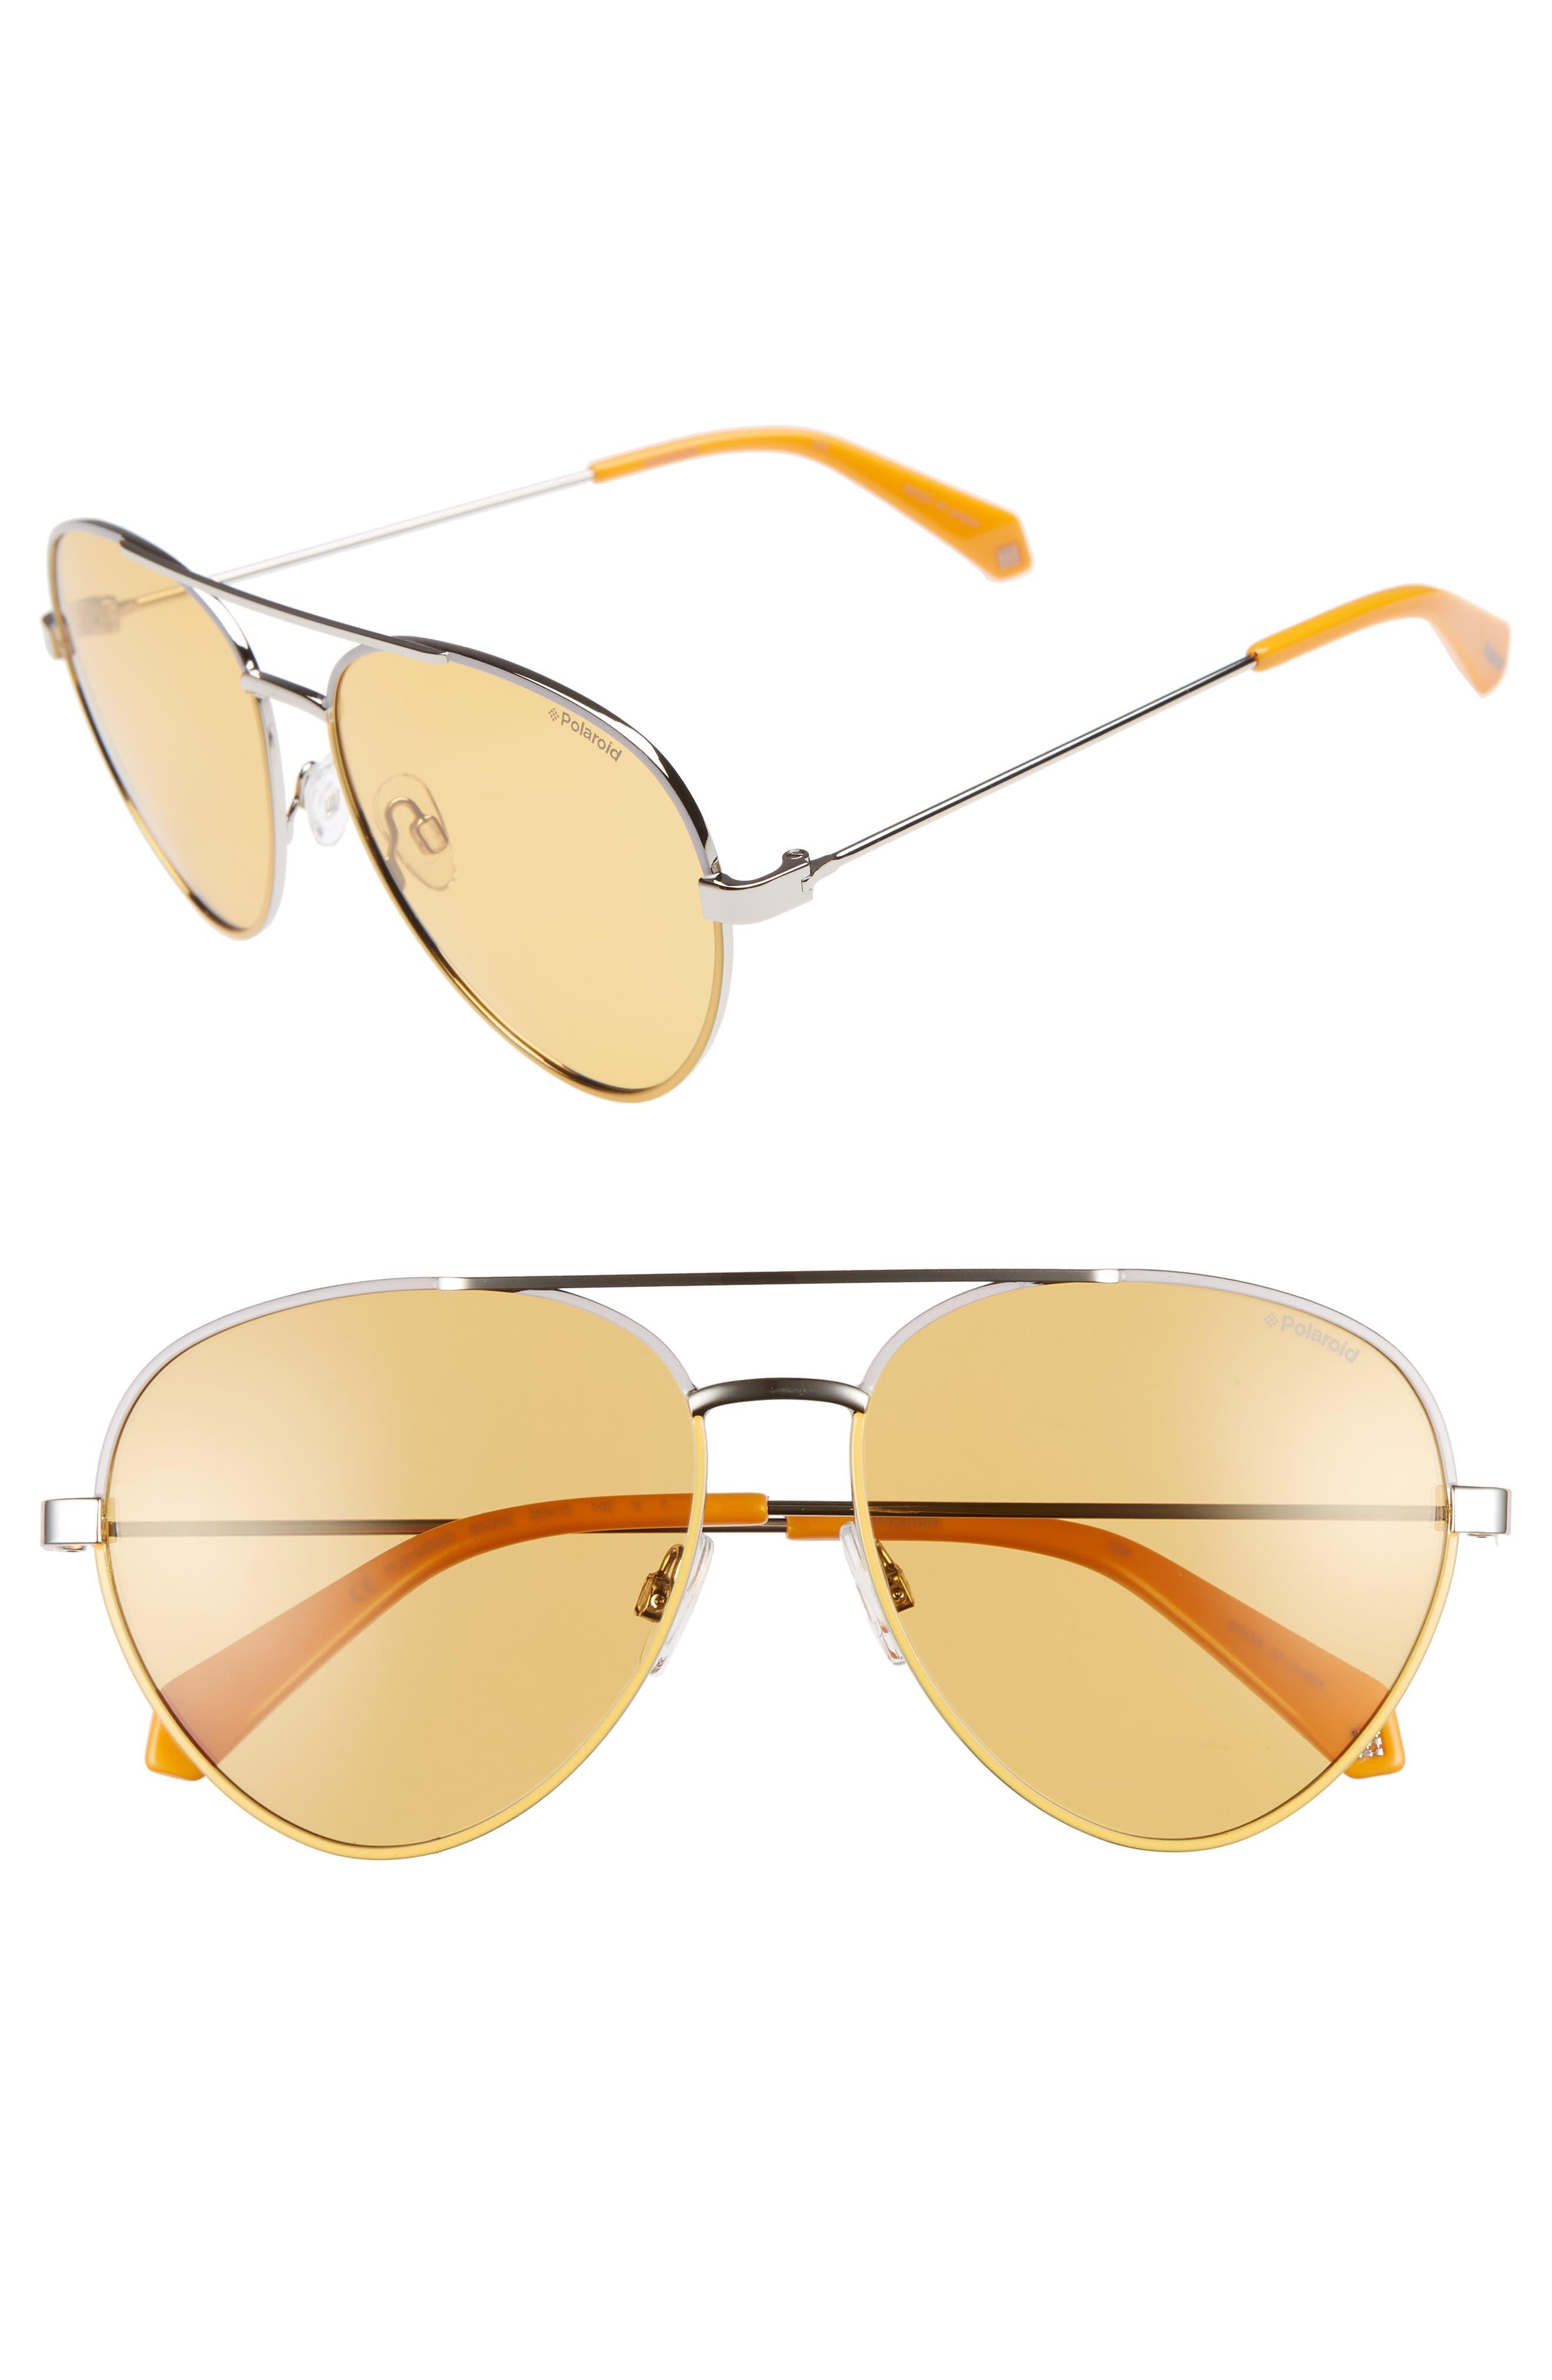 Polaroid 5m Polarized Aviator Sunglasses - Silver/ Yellow